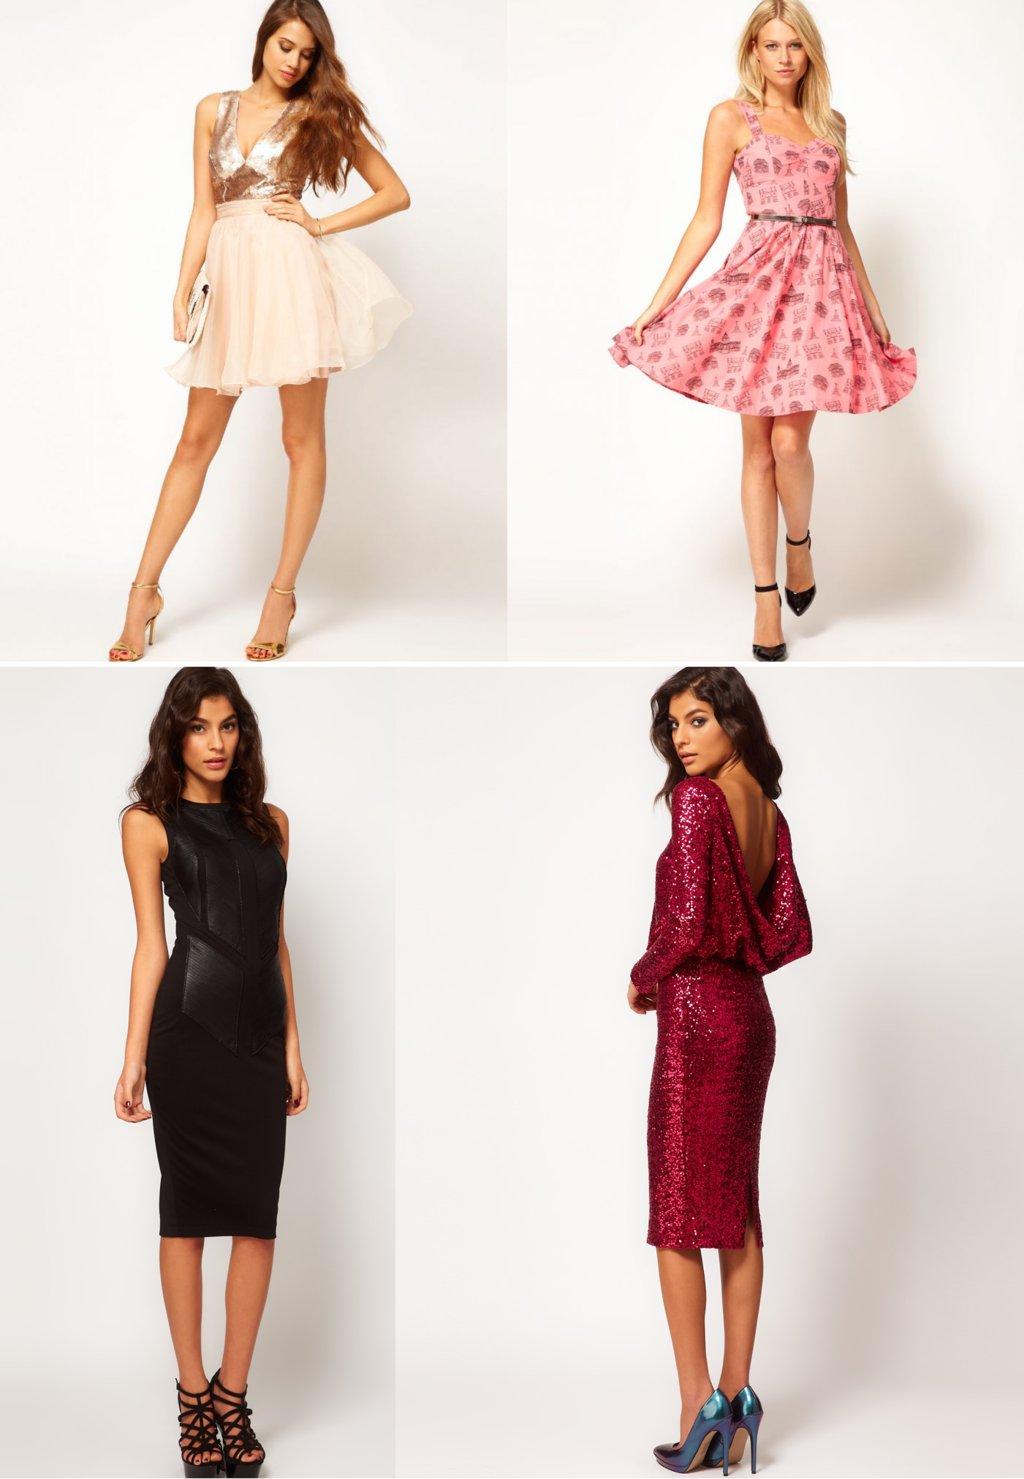 Top-bridesmaid-dress-alternatives-2013-weddings.full